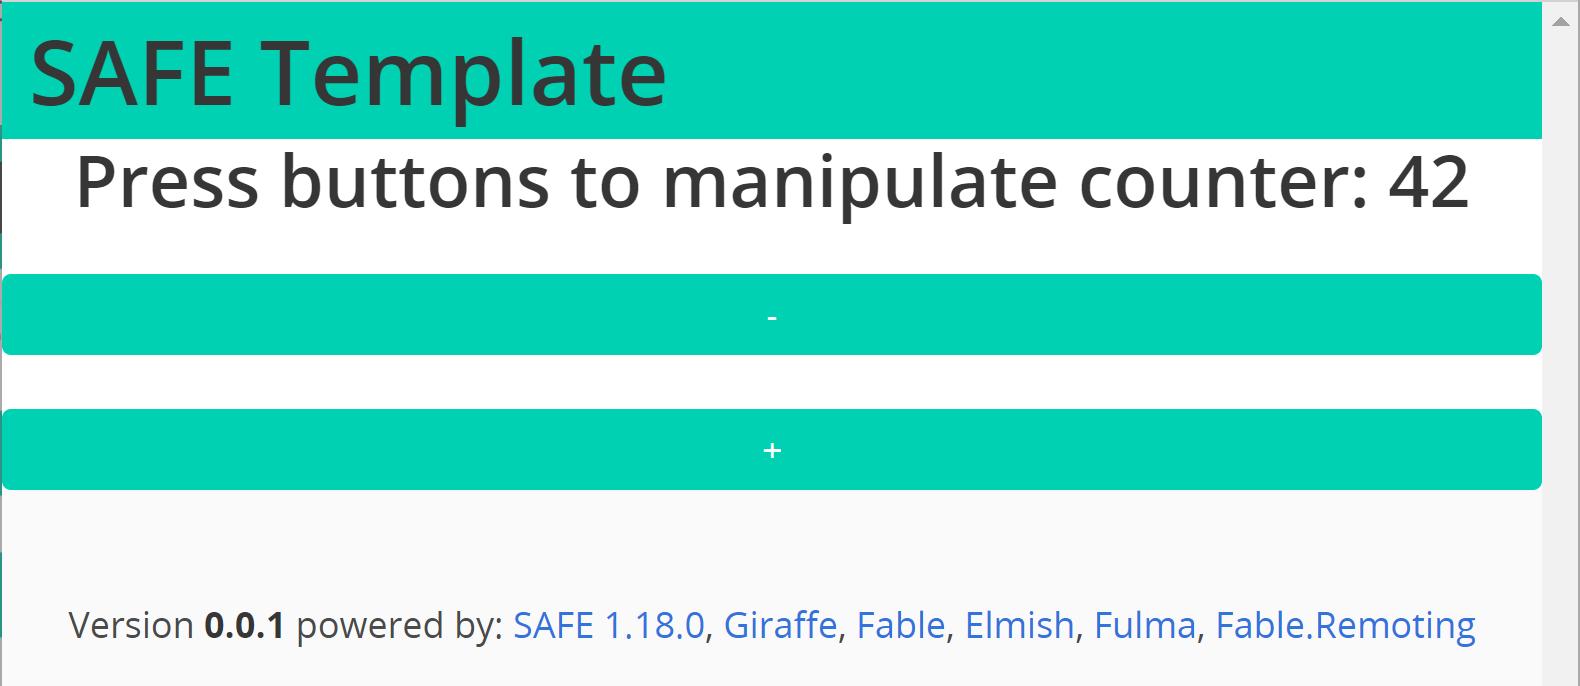 The default SAFE template